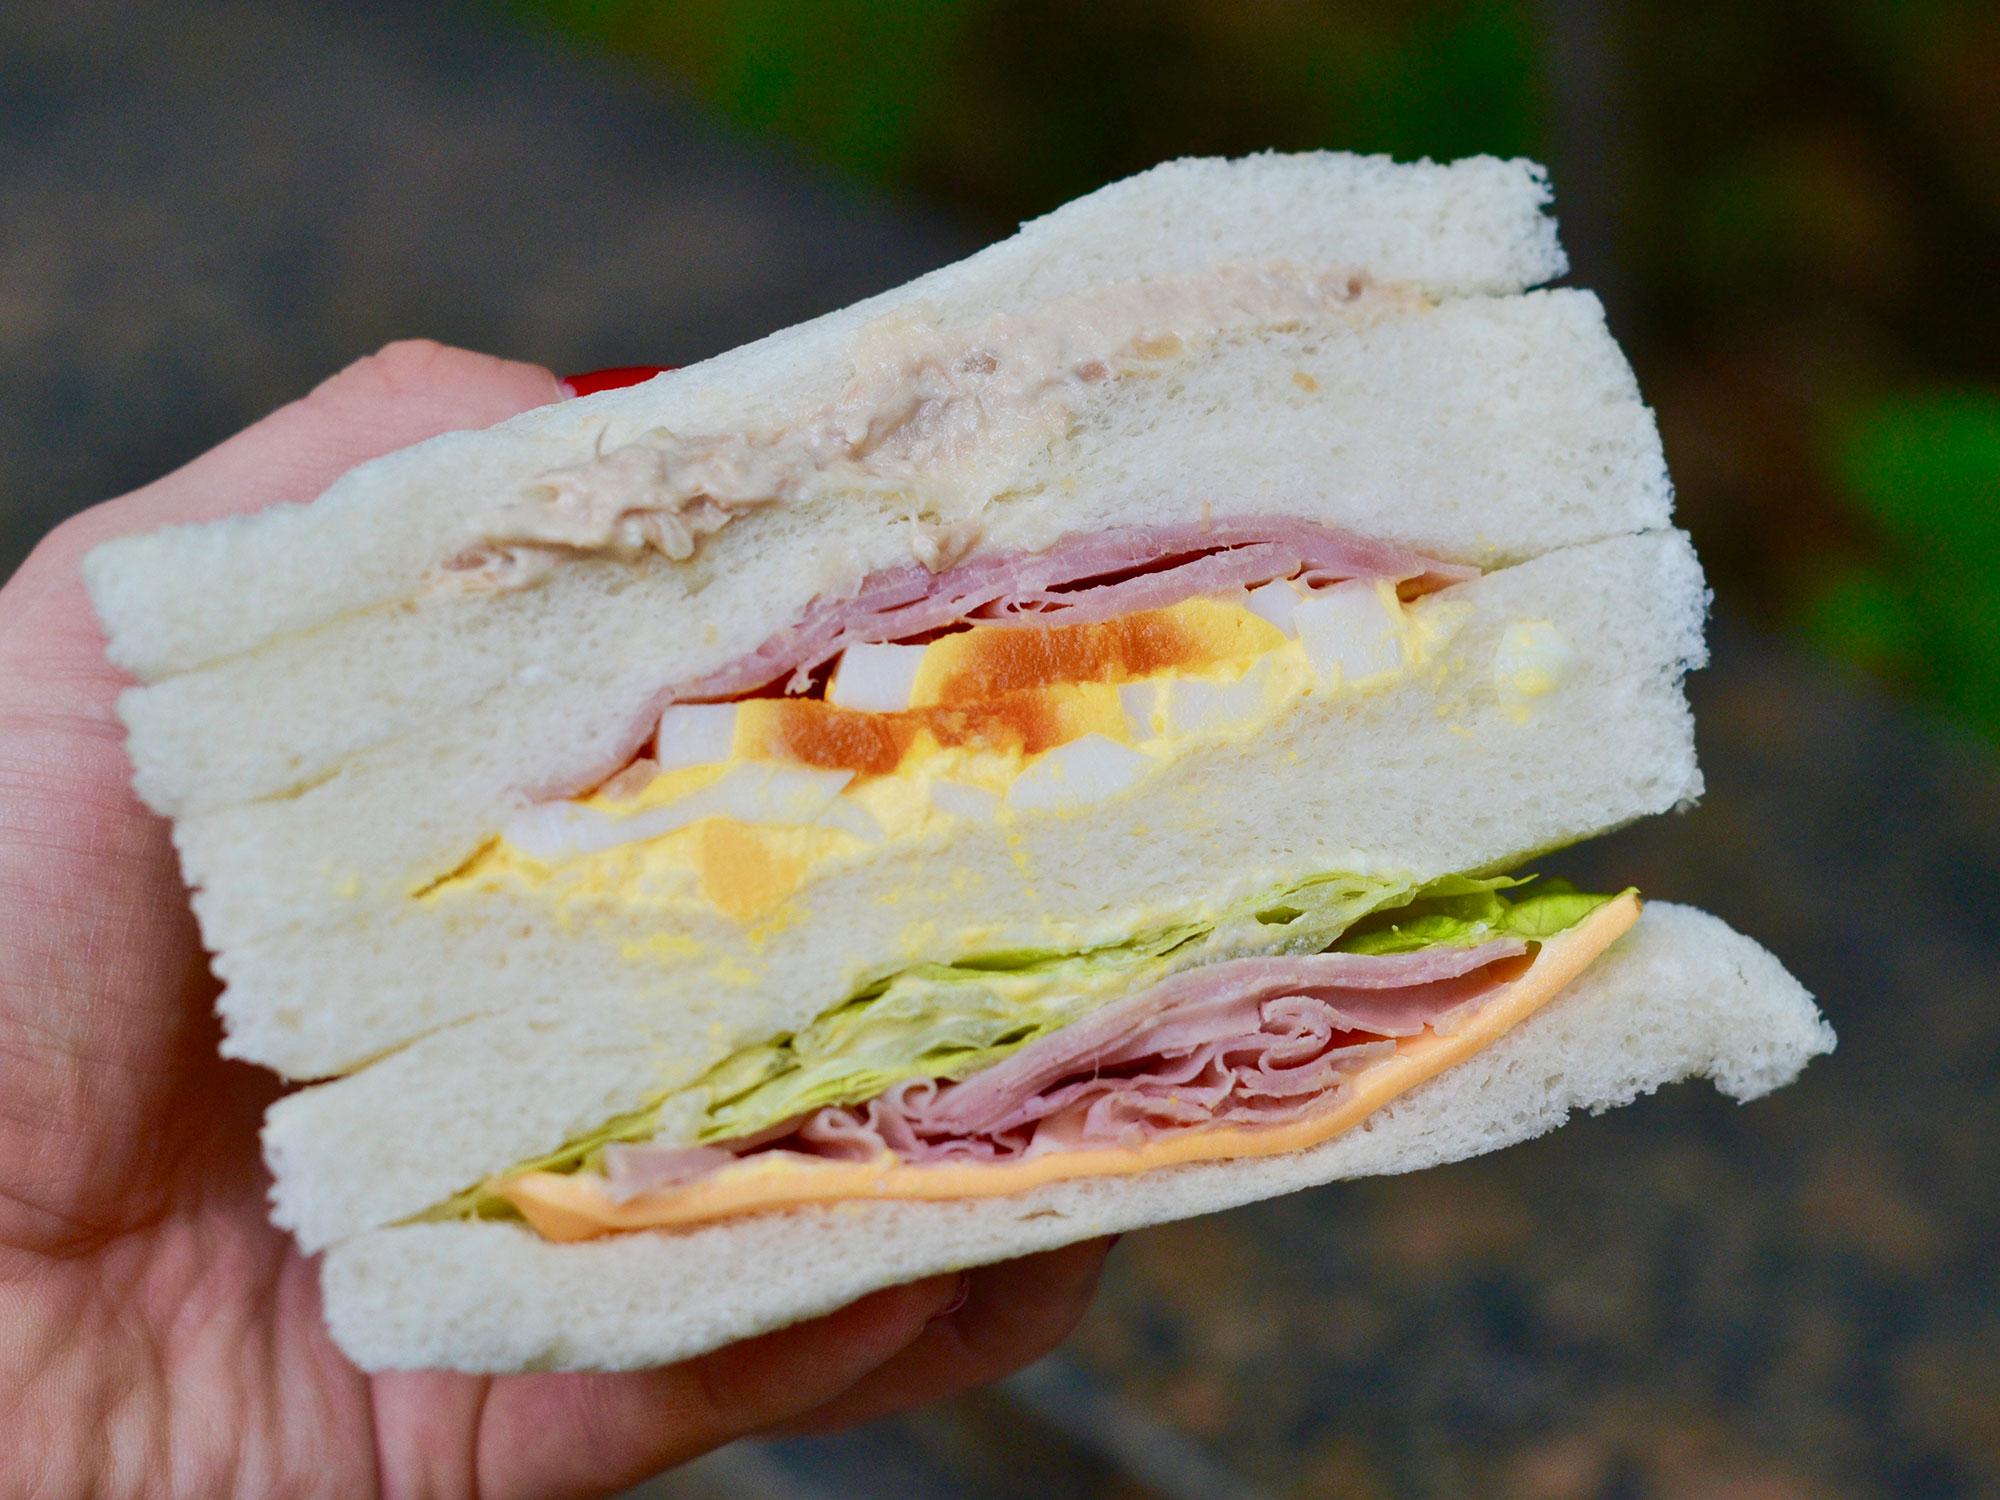 sandwich-1-7-11.jpg